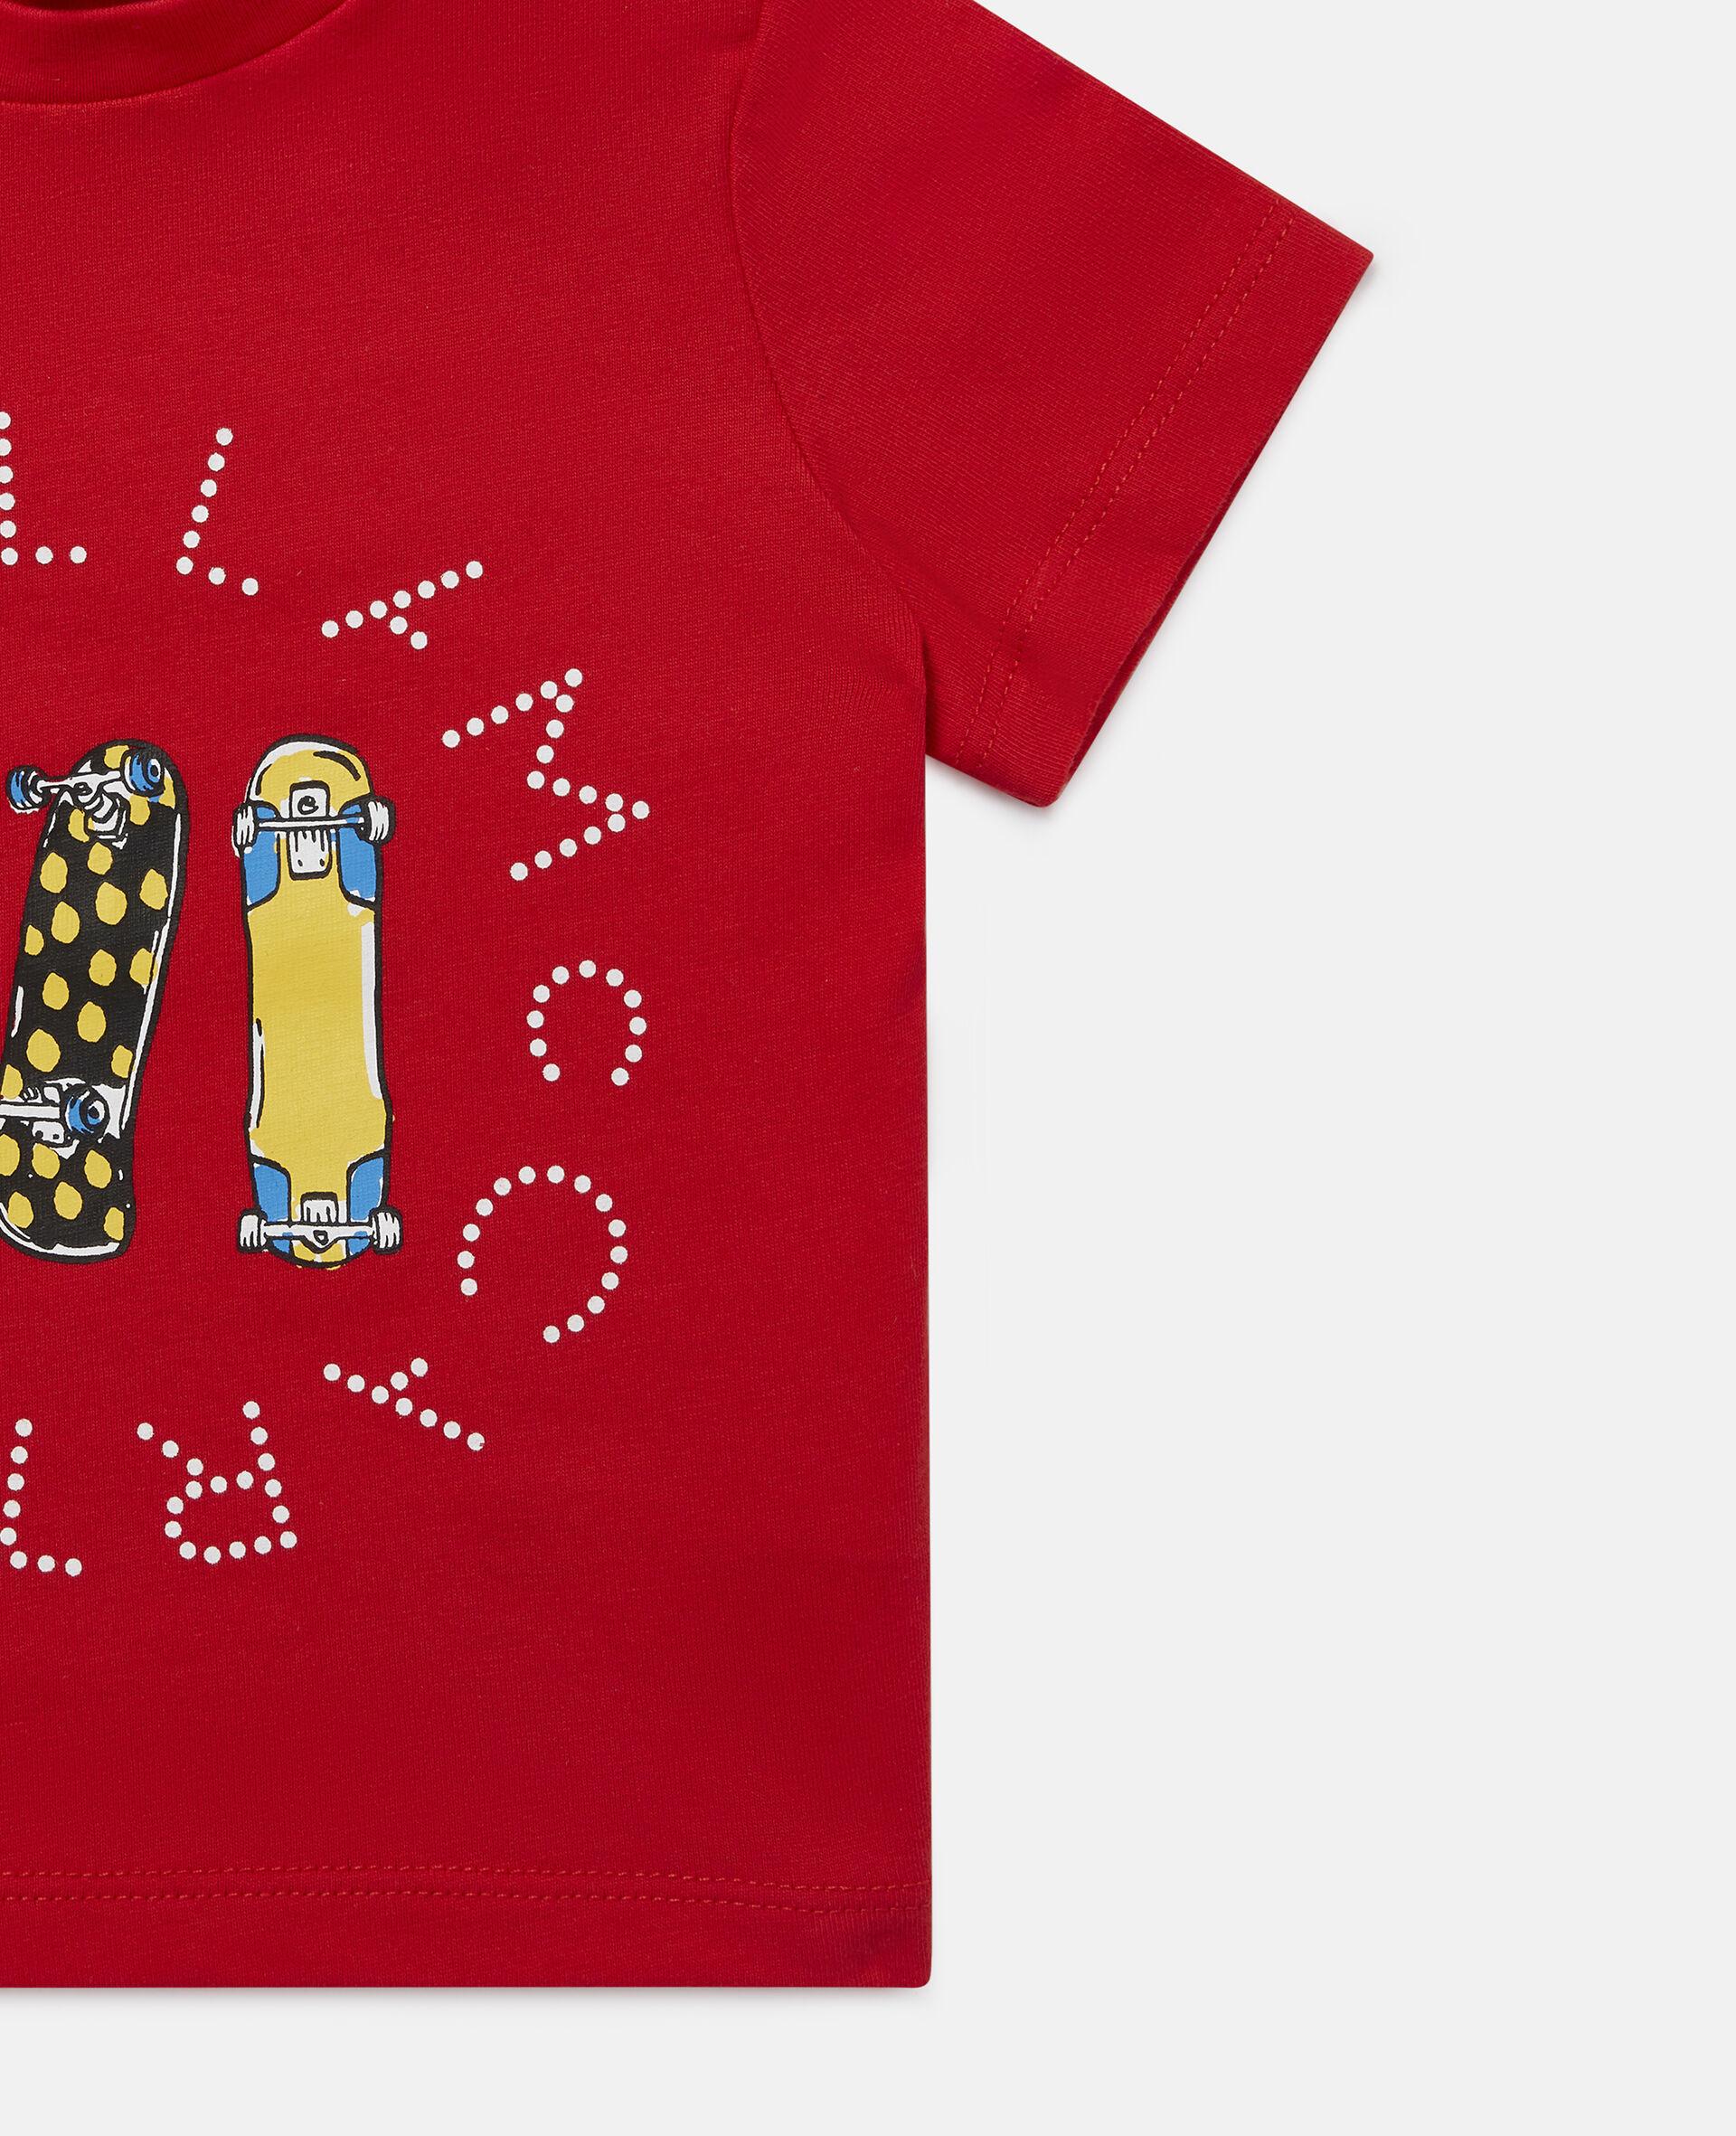 Skateboards Jersey T-Shirt-Red-large image number 1